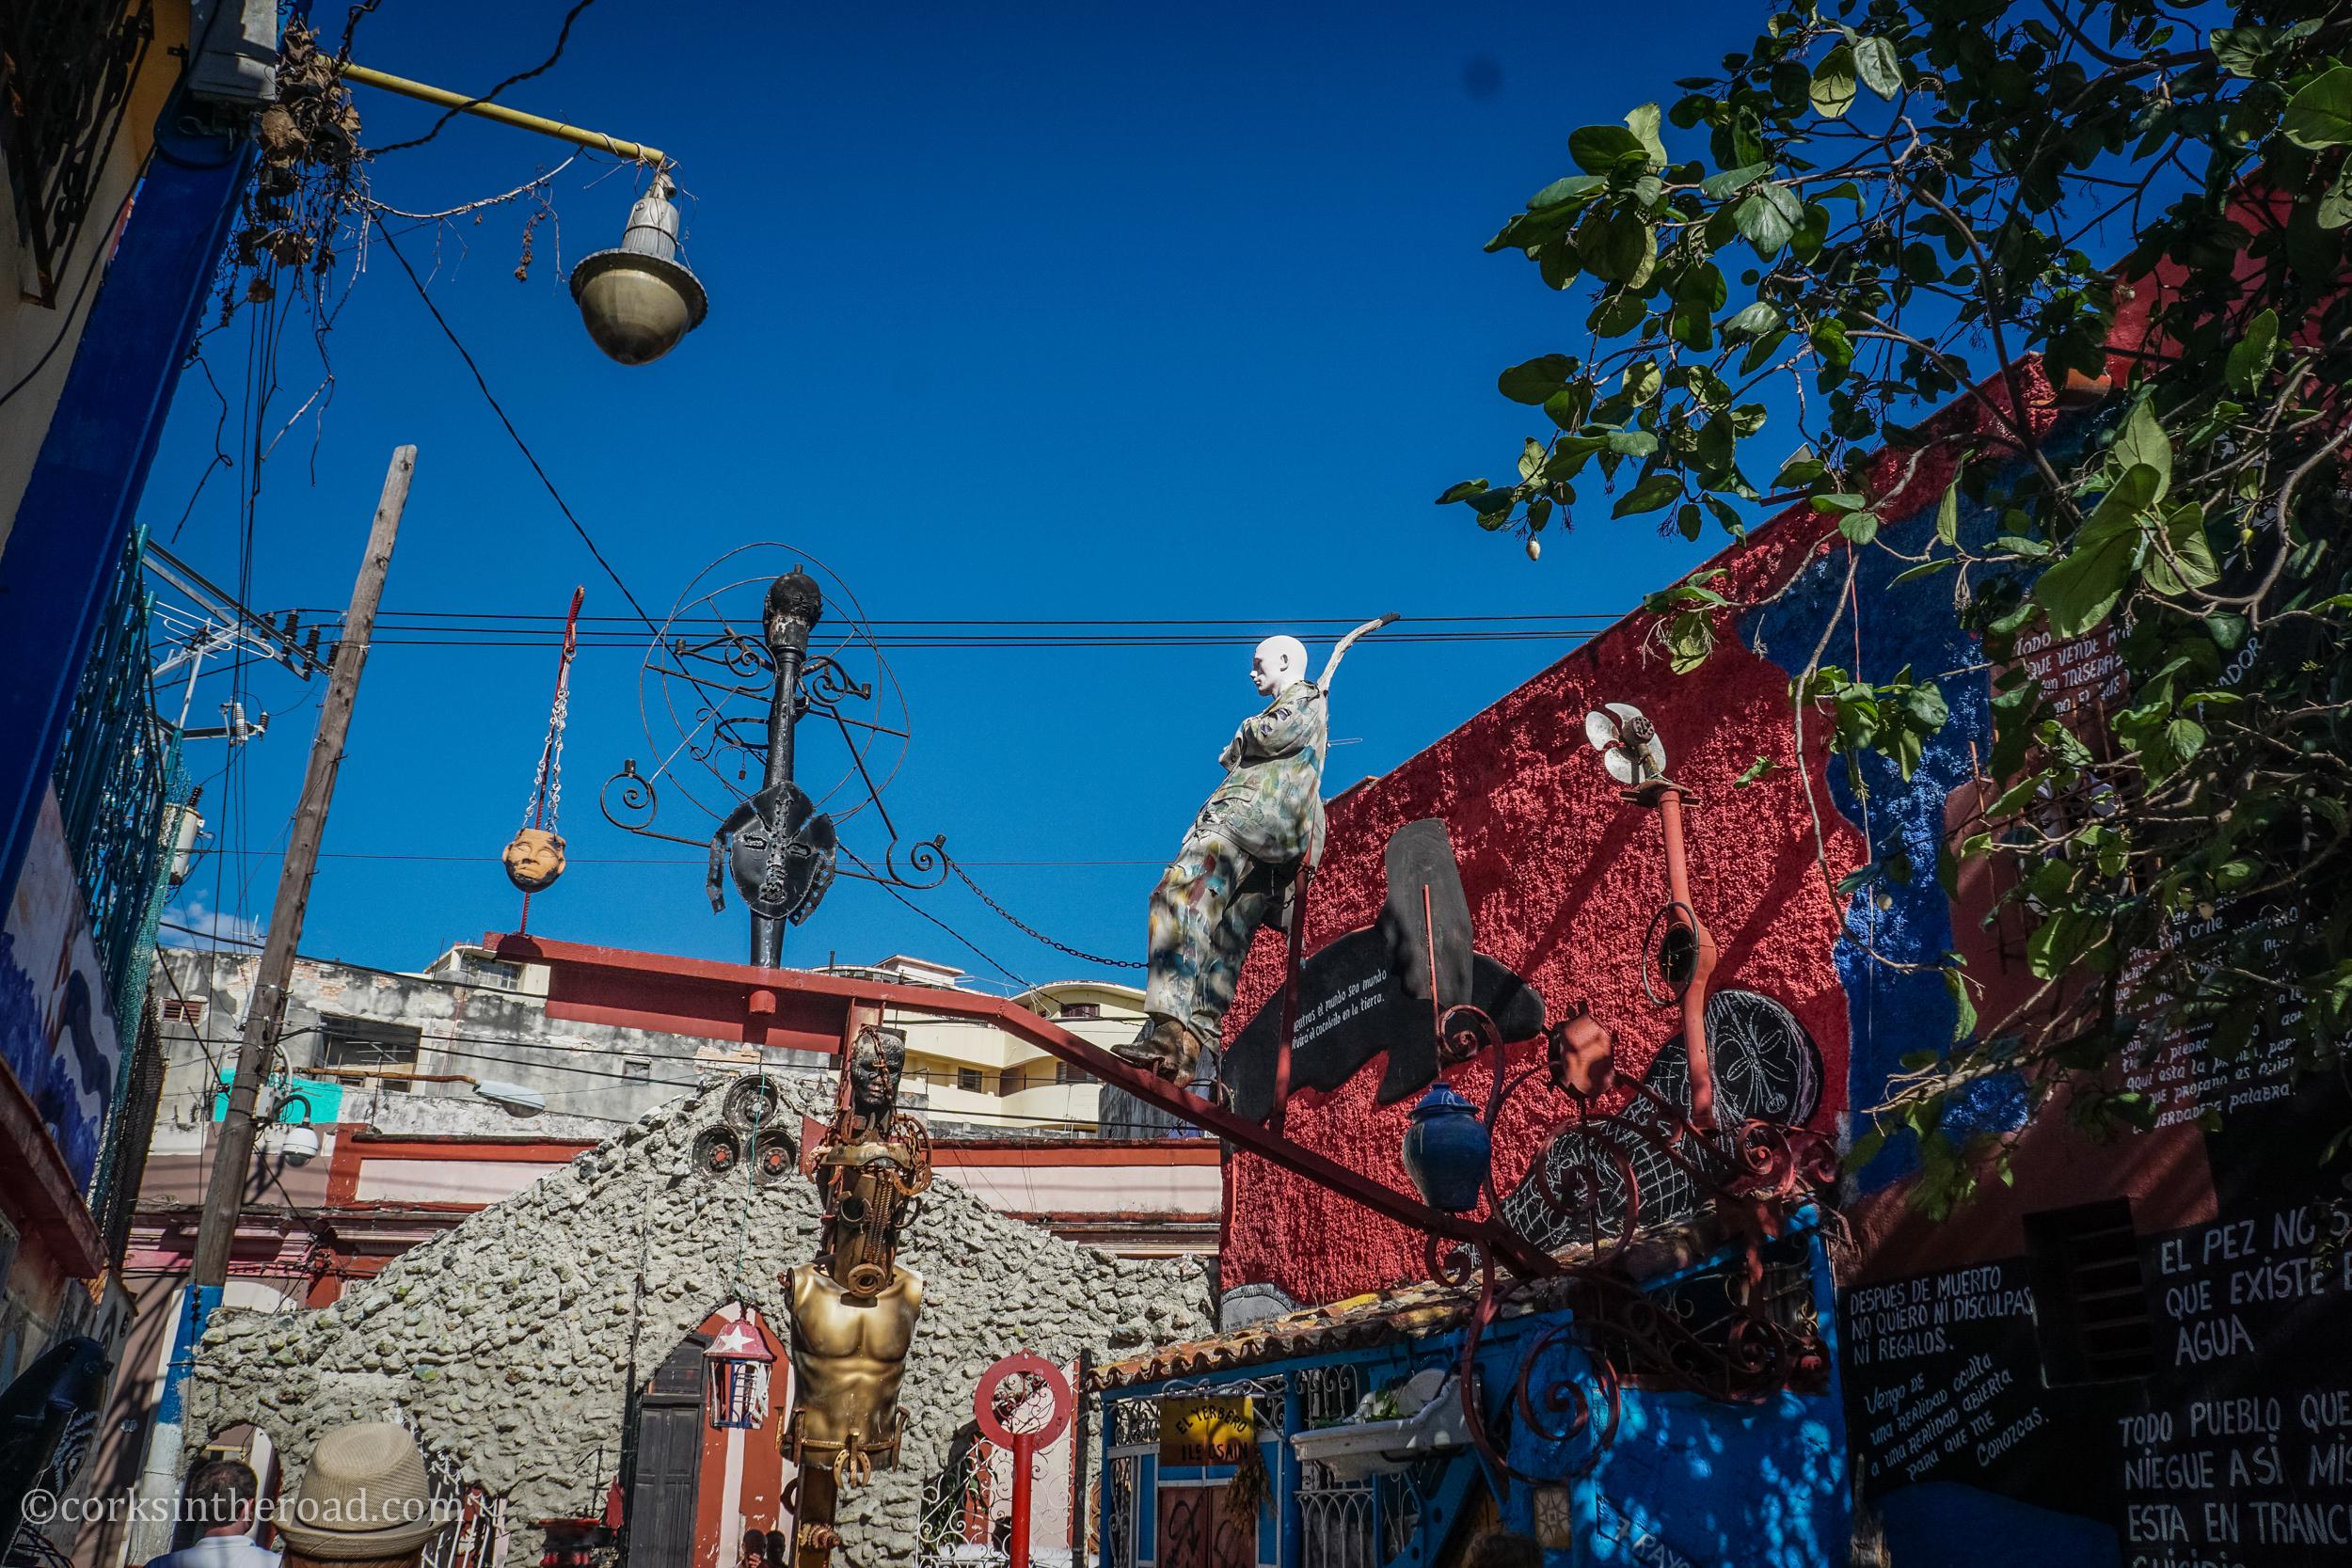 Corksintheroad, Cuba, Hamel, Street Art-5.jpg